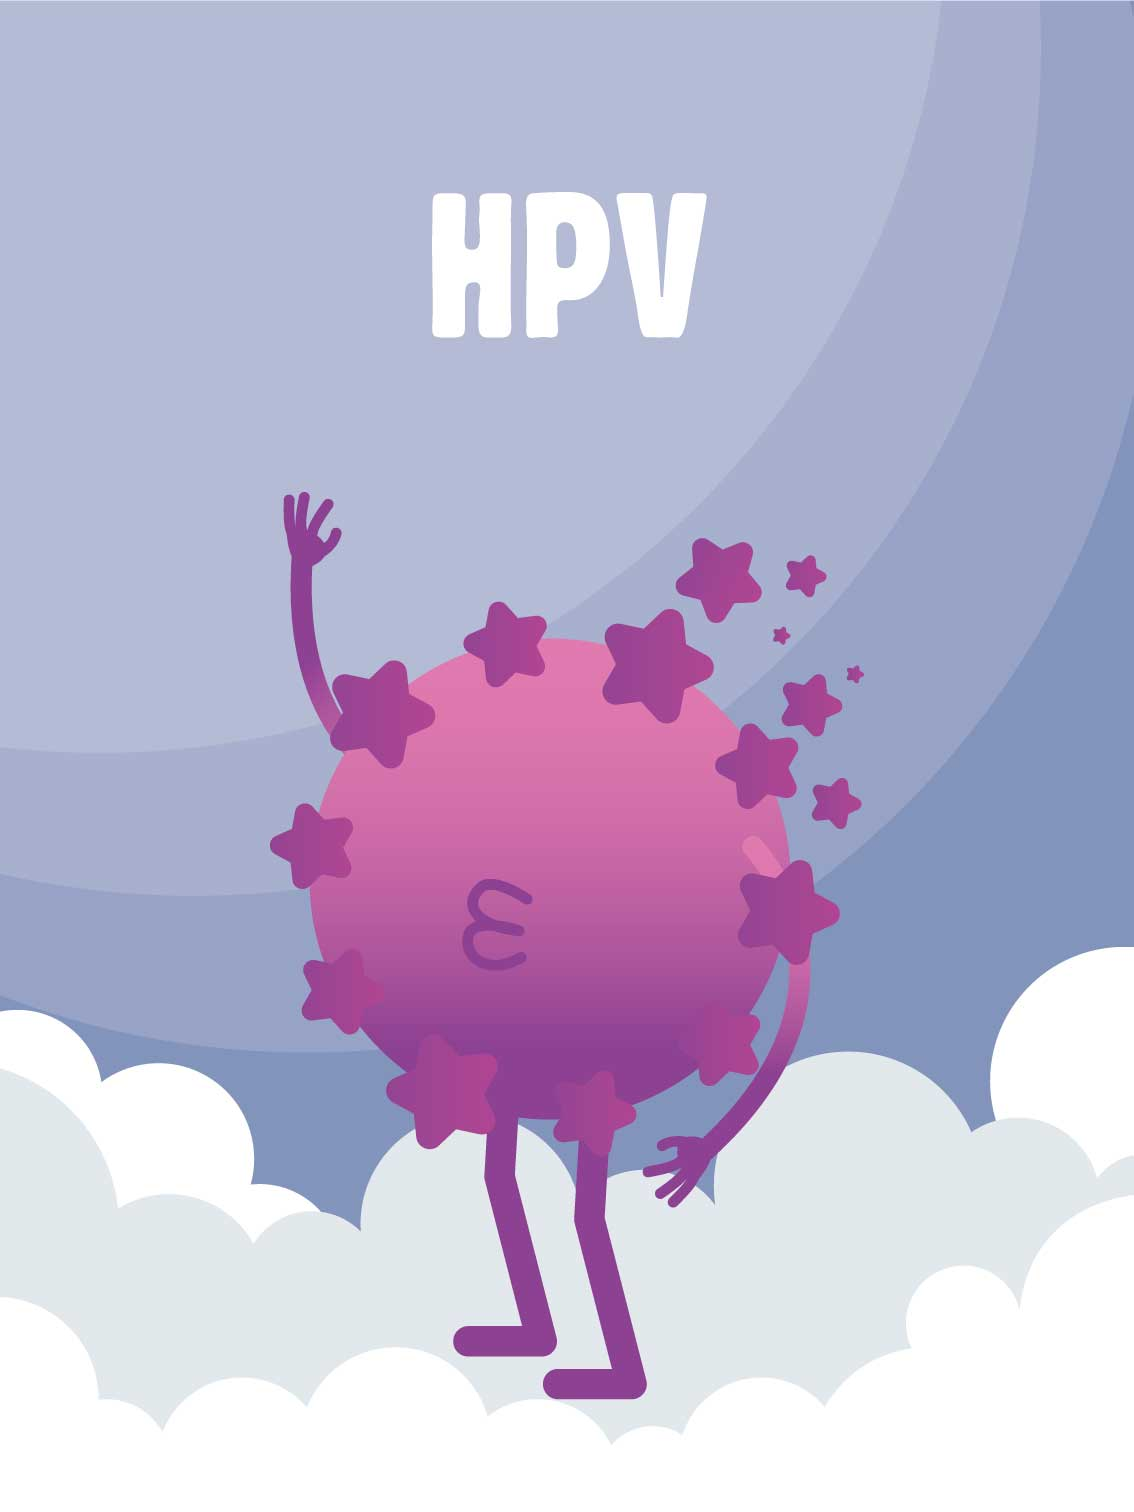 Category: Hacyrane - Papillomavirus homme gorge symptomes - Ist papillomavirus homme